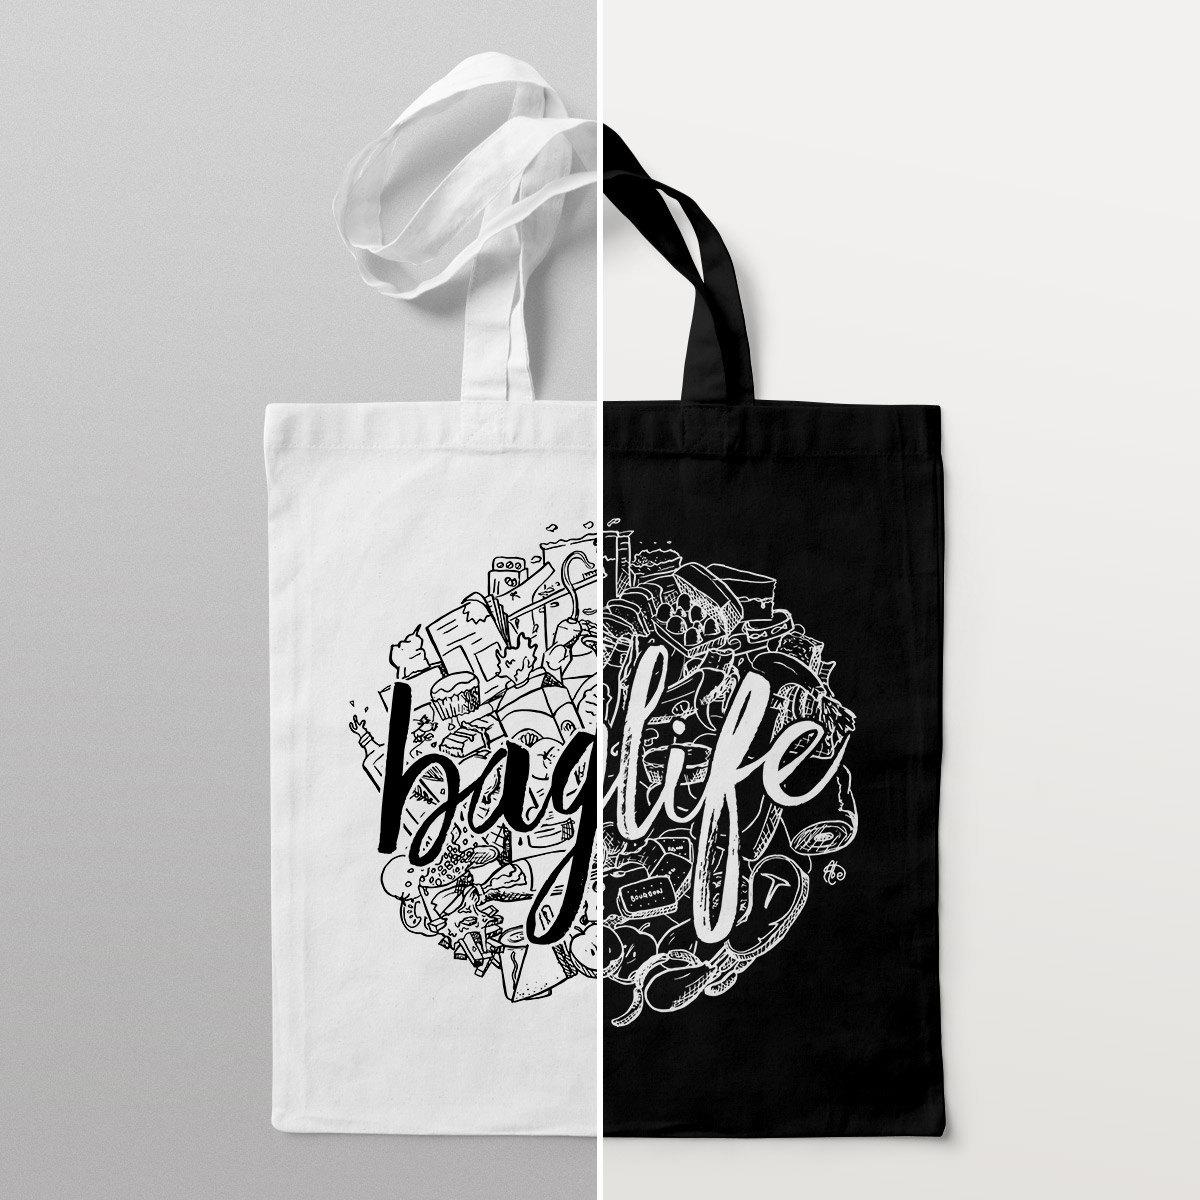 'Baglife' Tote Bag by Things By Us